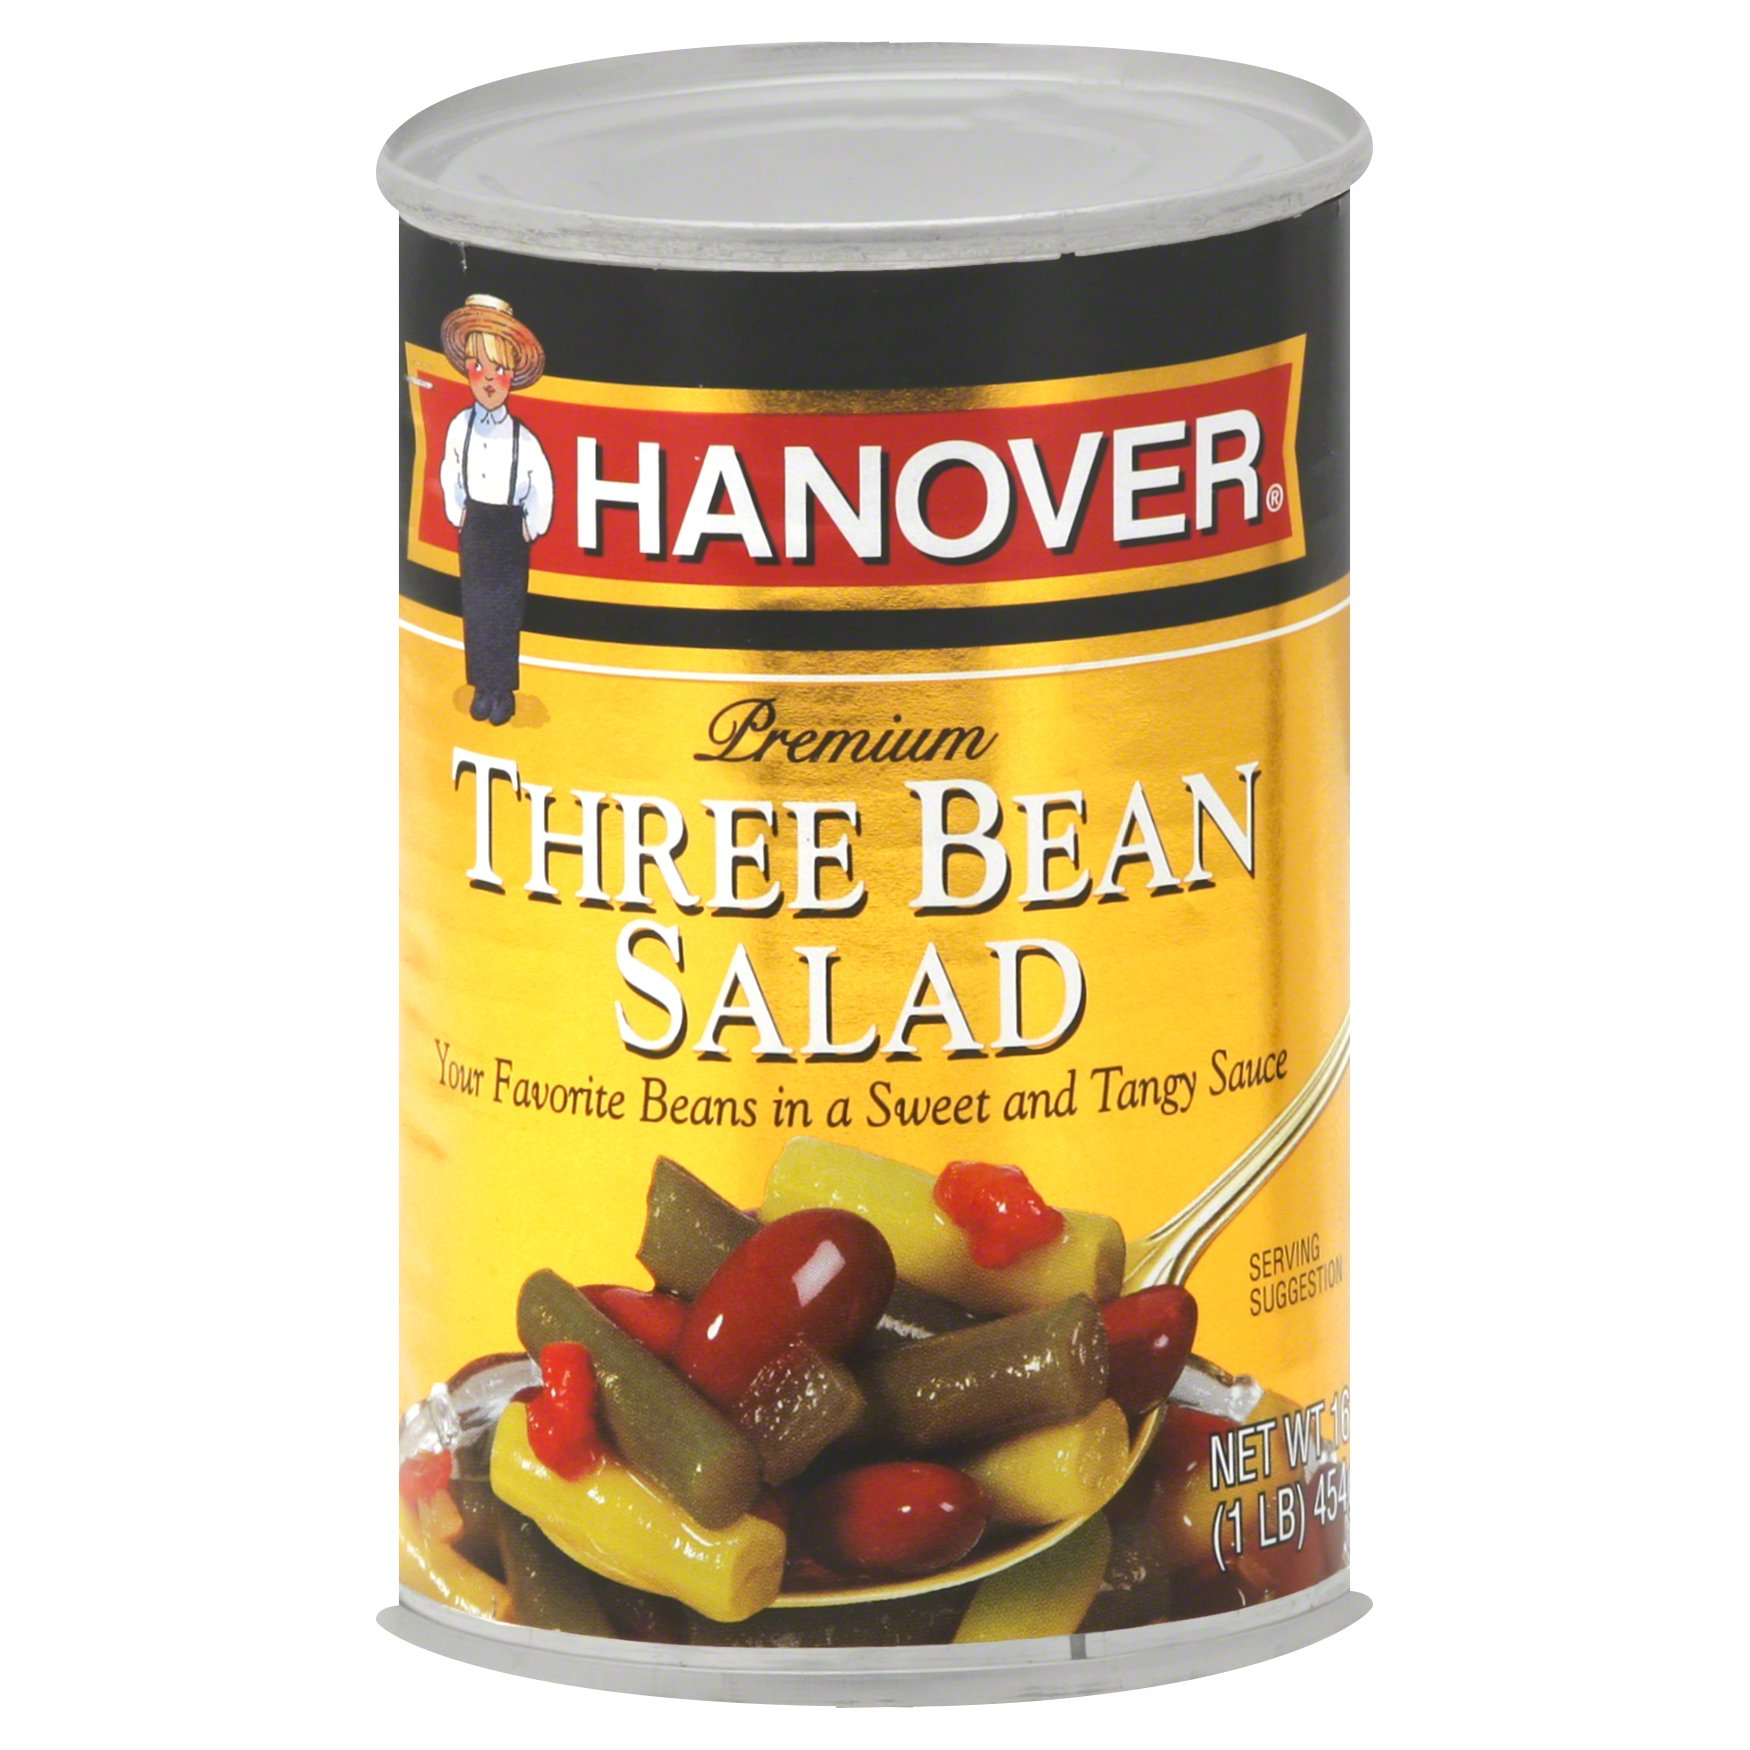 Hanover Premium Three Bean Salad 16OZ 12-Pack